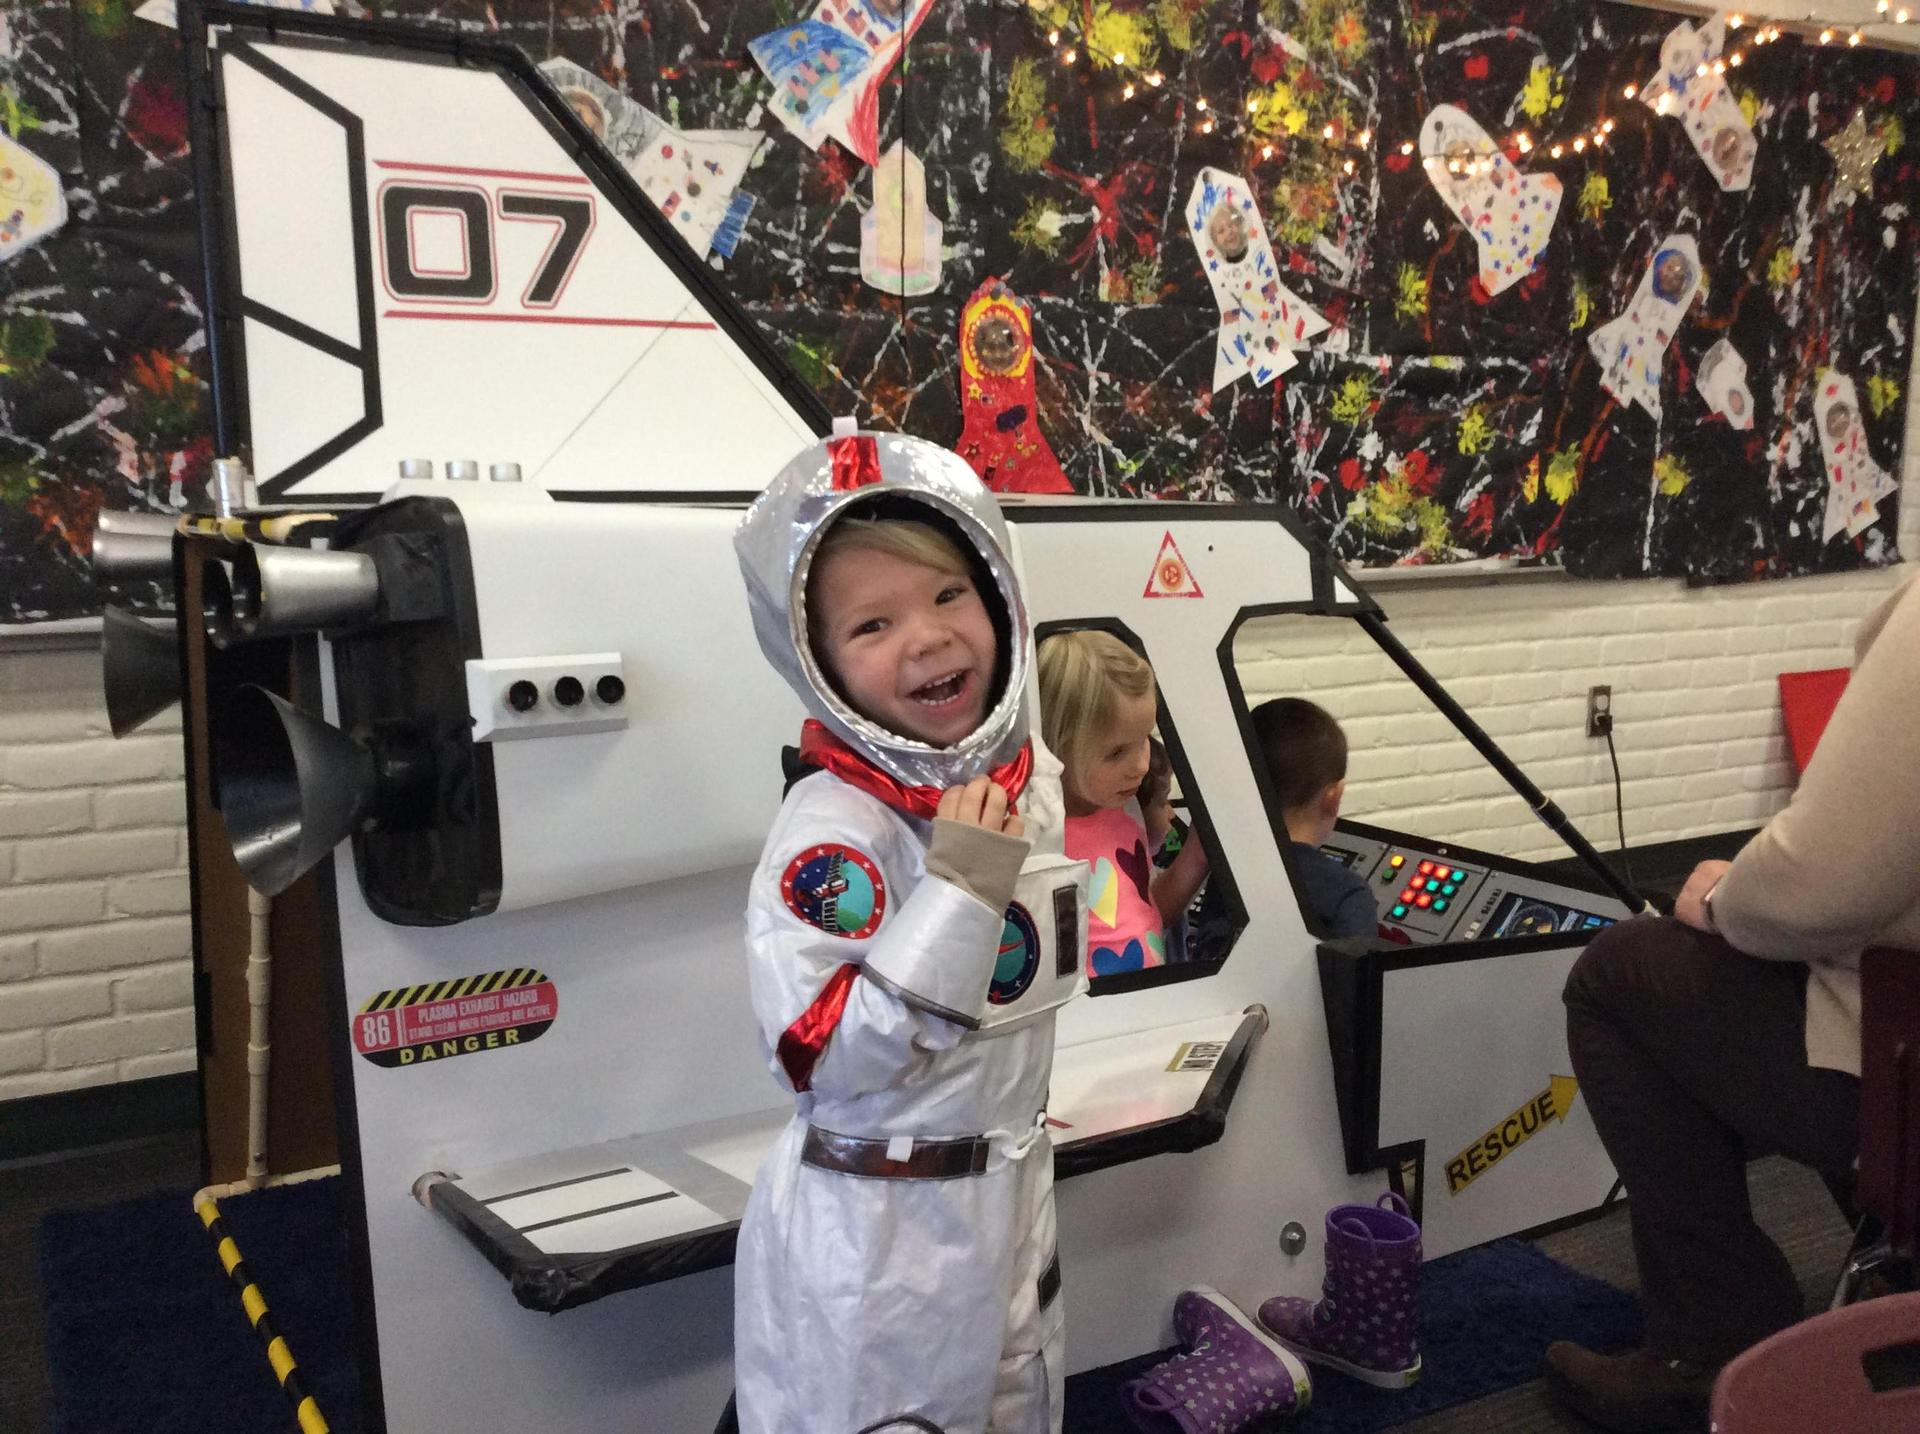 kid in spaceship suit by little rocket